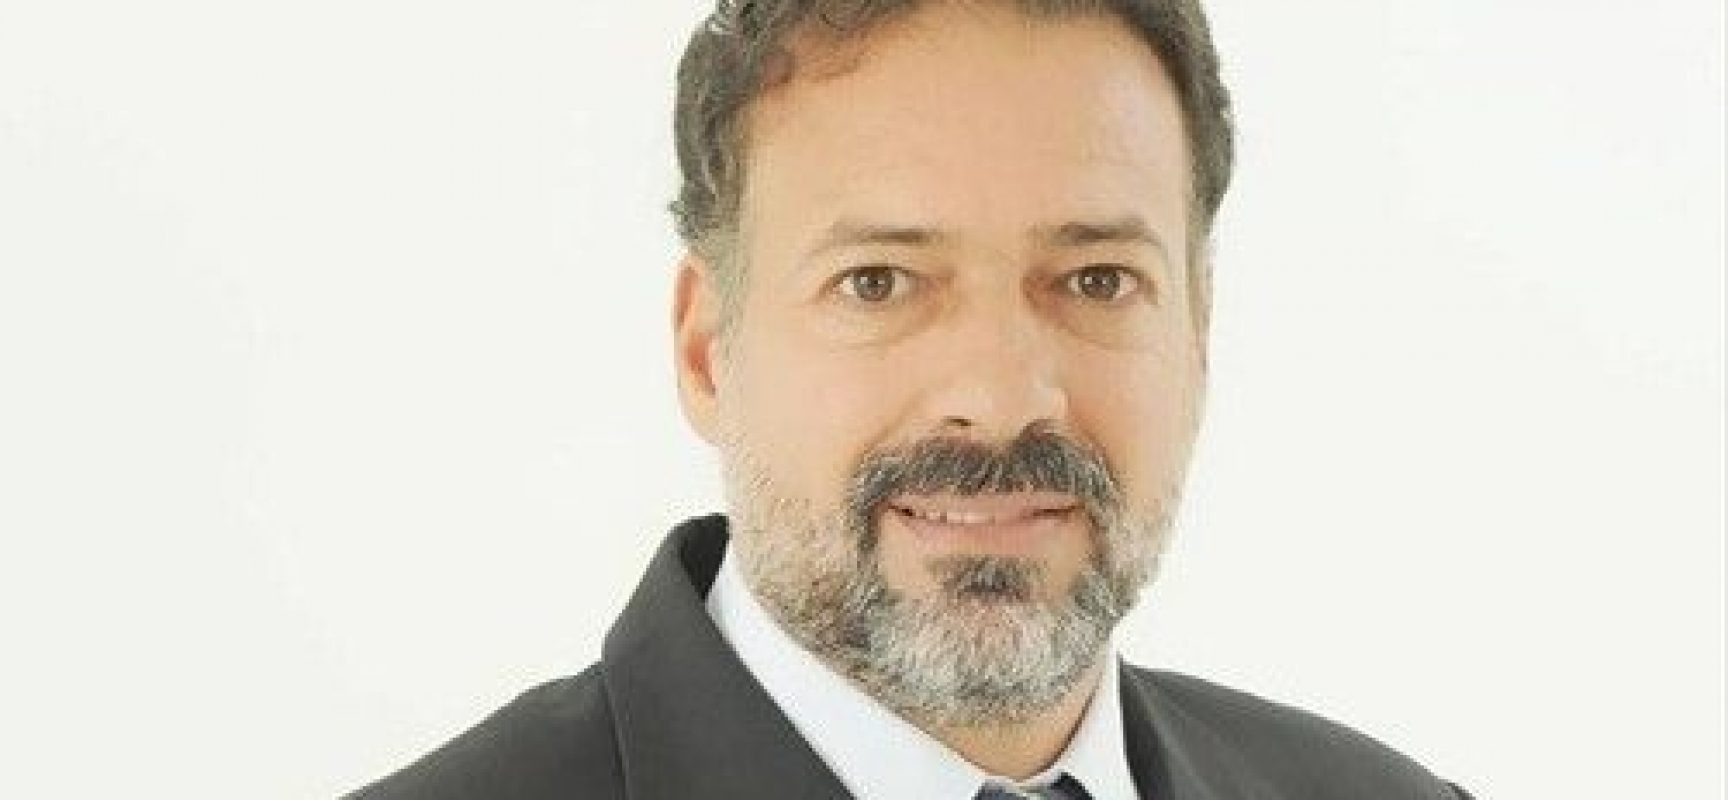 Entrevista Clóvis Júnior – presidente da CDL de Ilhéus